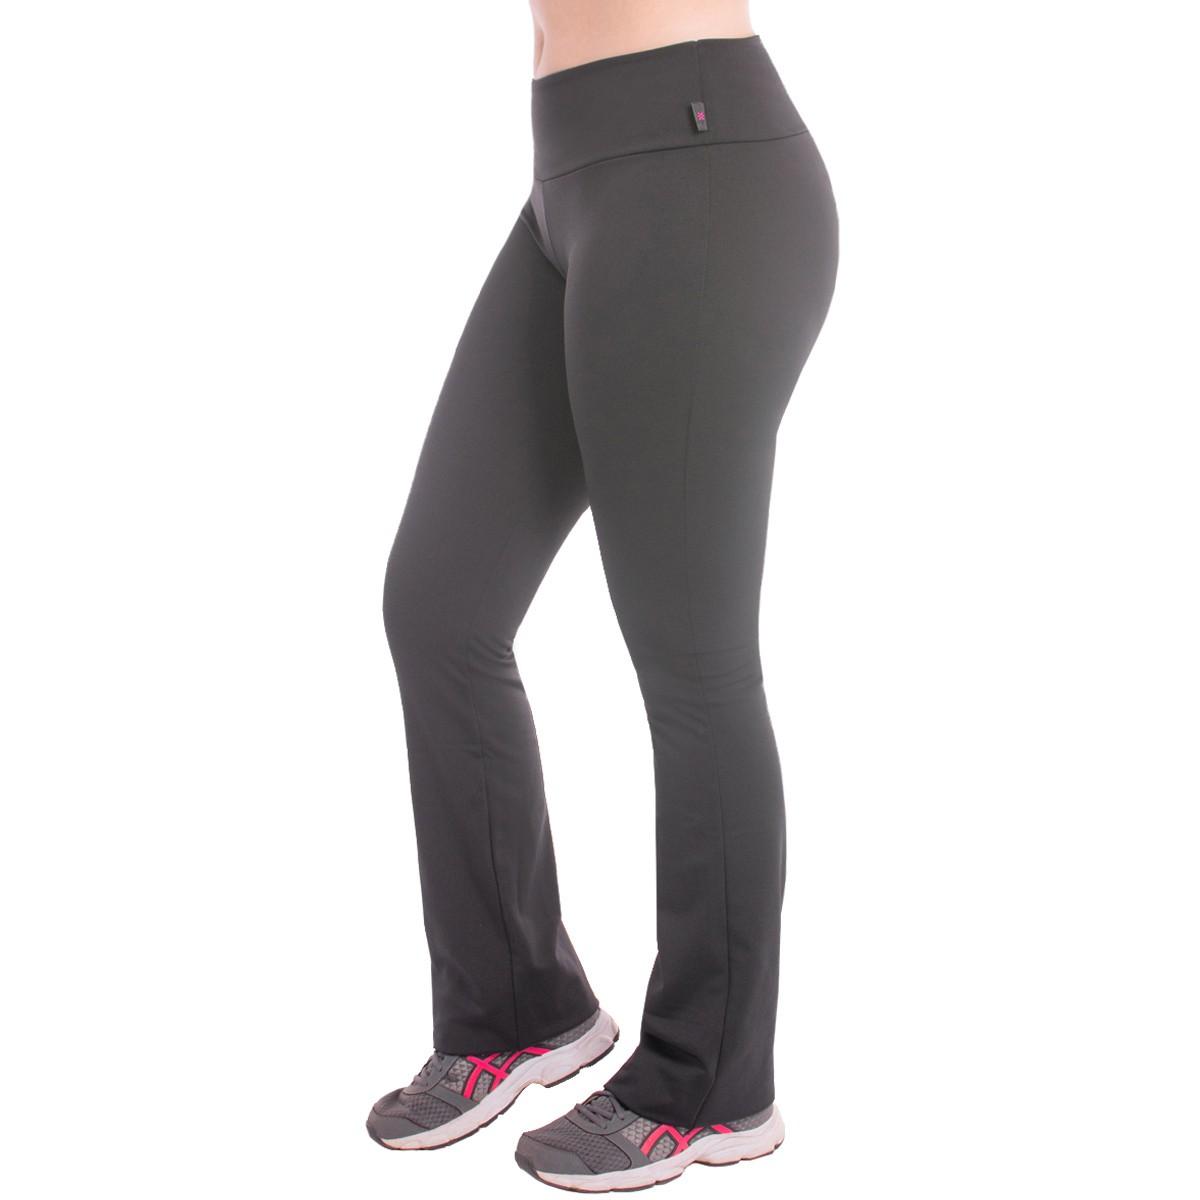 Kit com 7 Calças Legging Feminina Bailarina Peluciada Flare